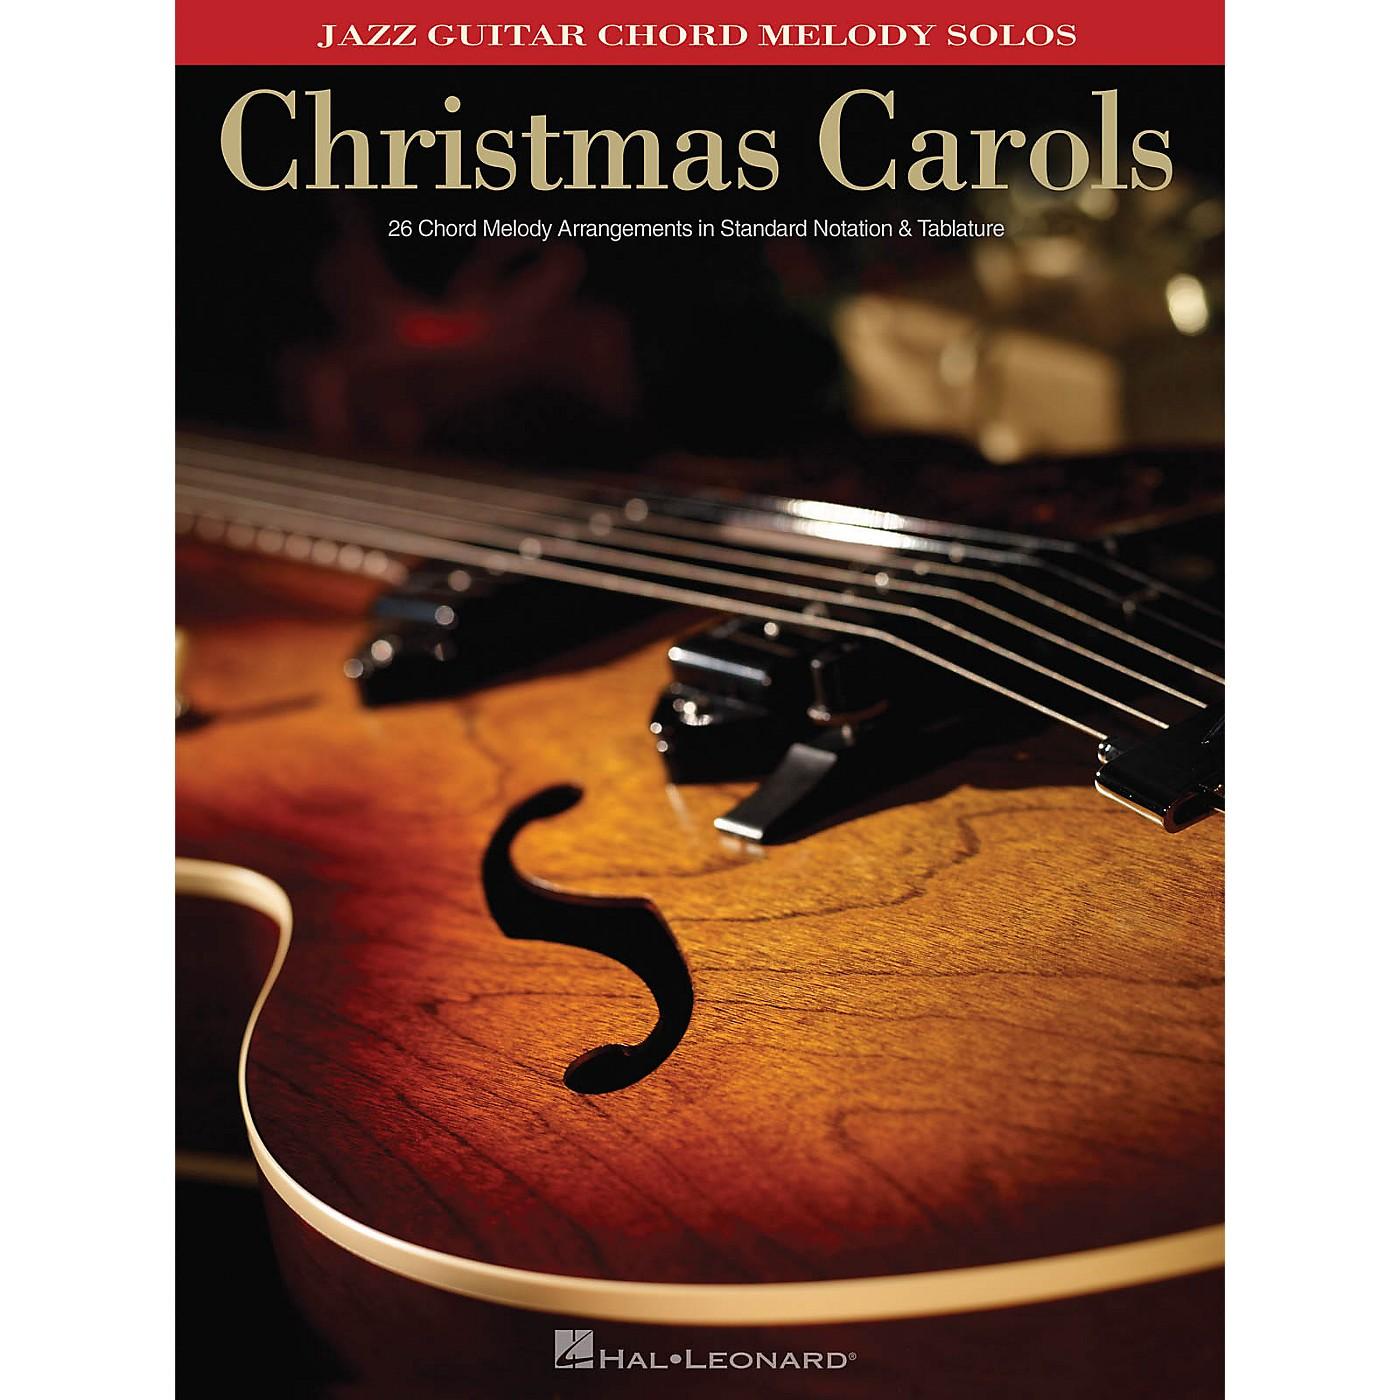 Hal Leonard Christmas Carols (Jazz Guitar Chord Melody Solos) Guitar Solo Series Softcover thumbnail